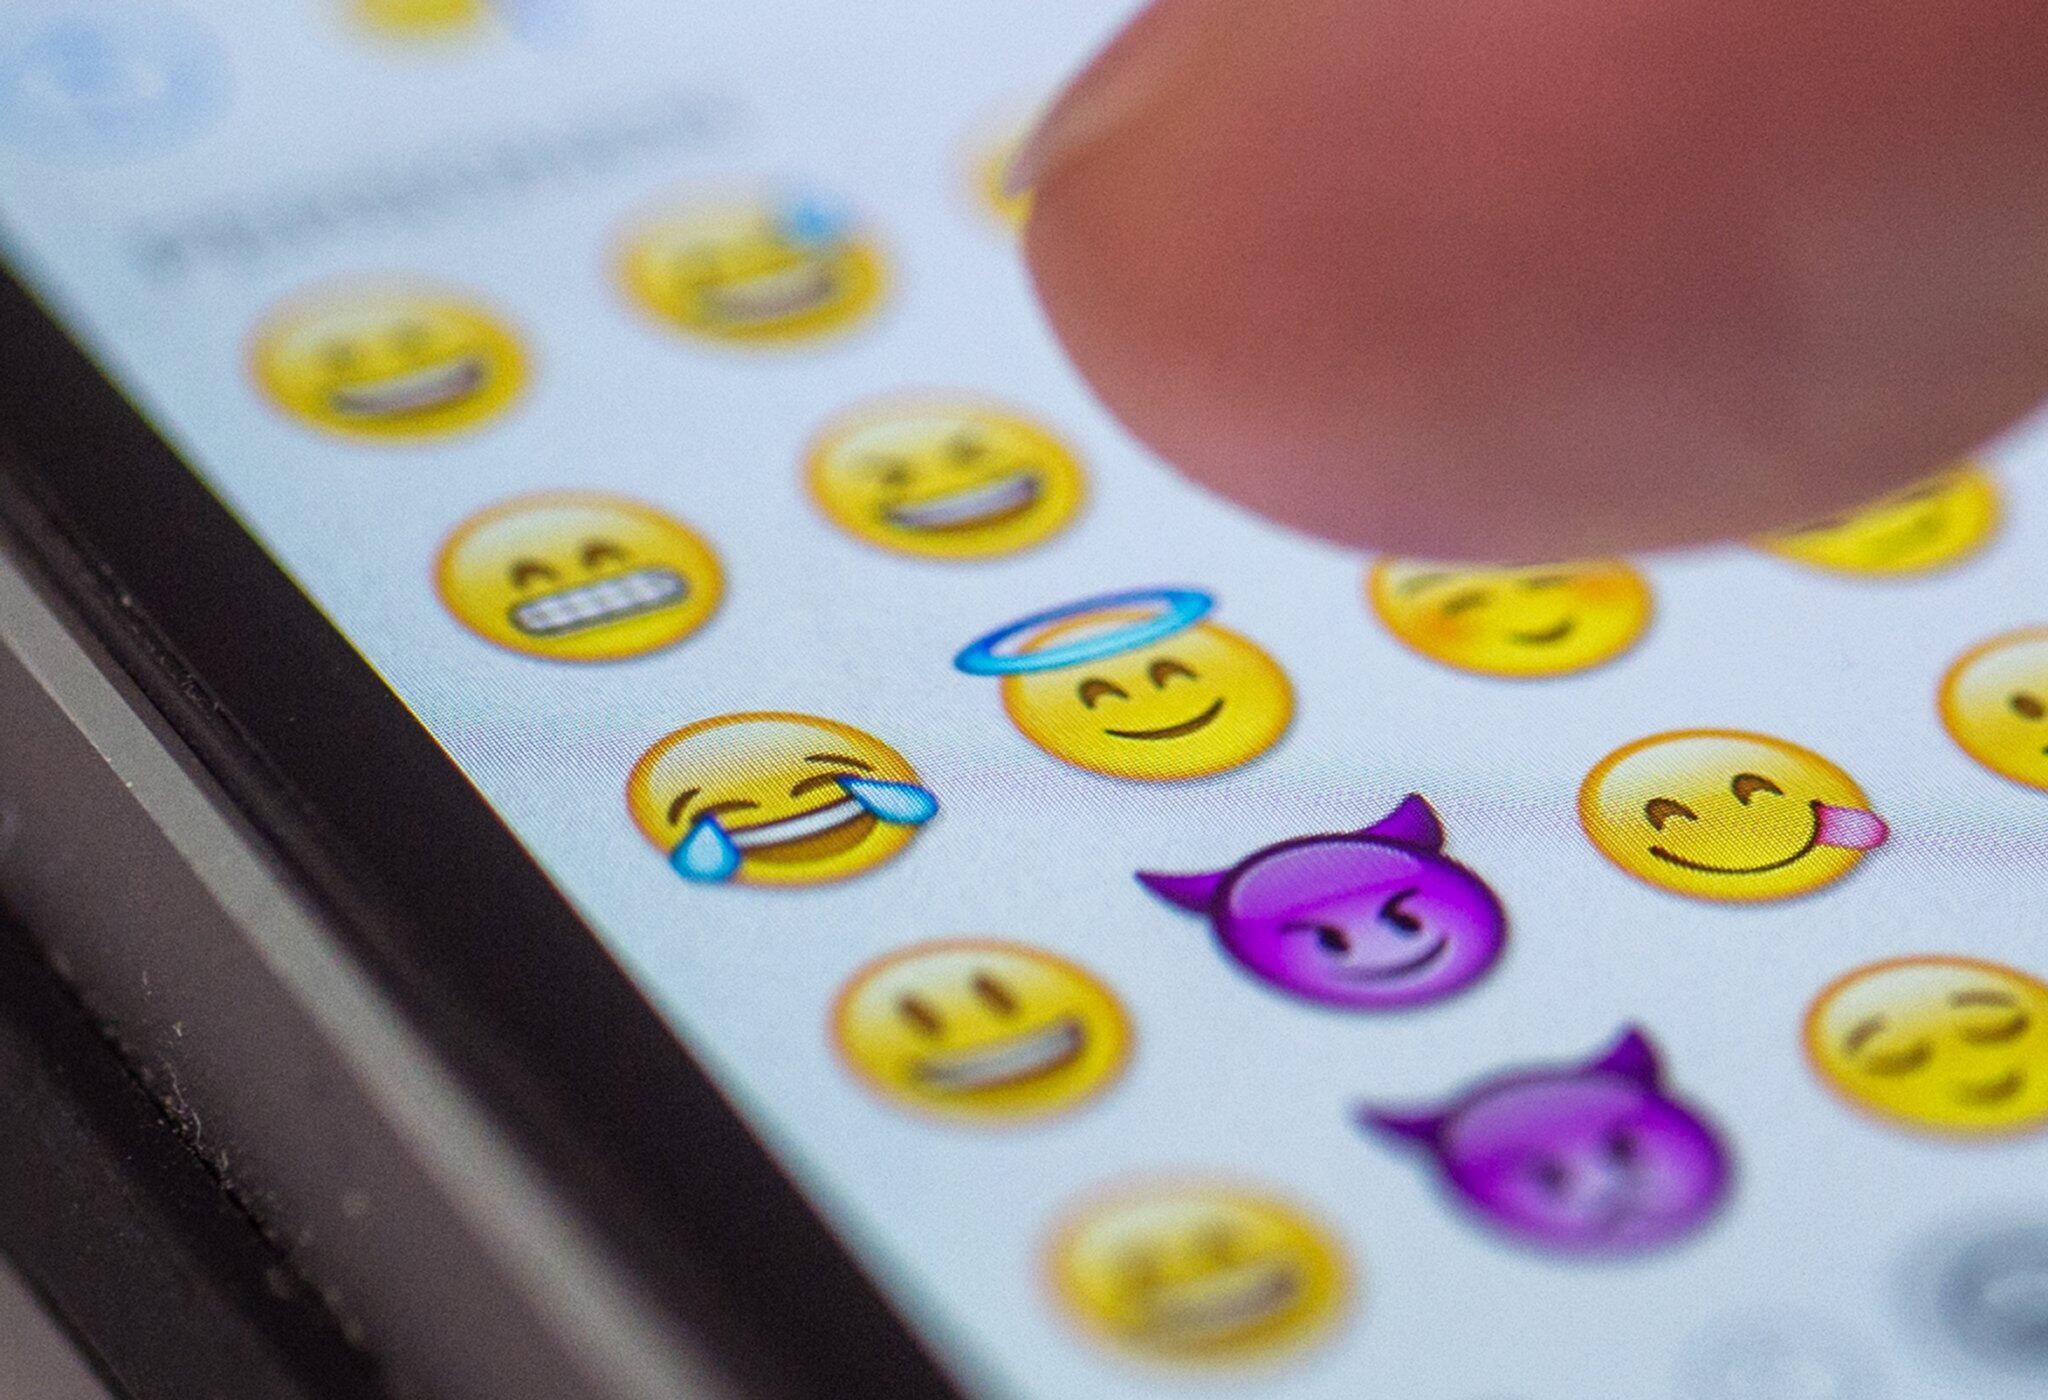 Bild zu Social-Media-Charts 2016 - Freudentränen-Emoji